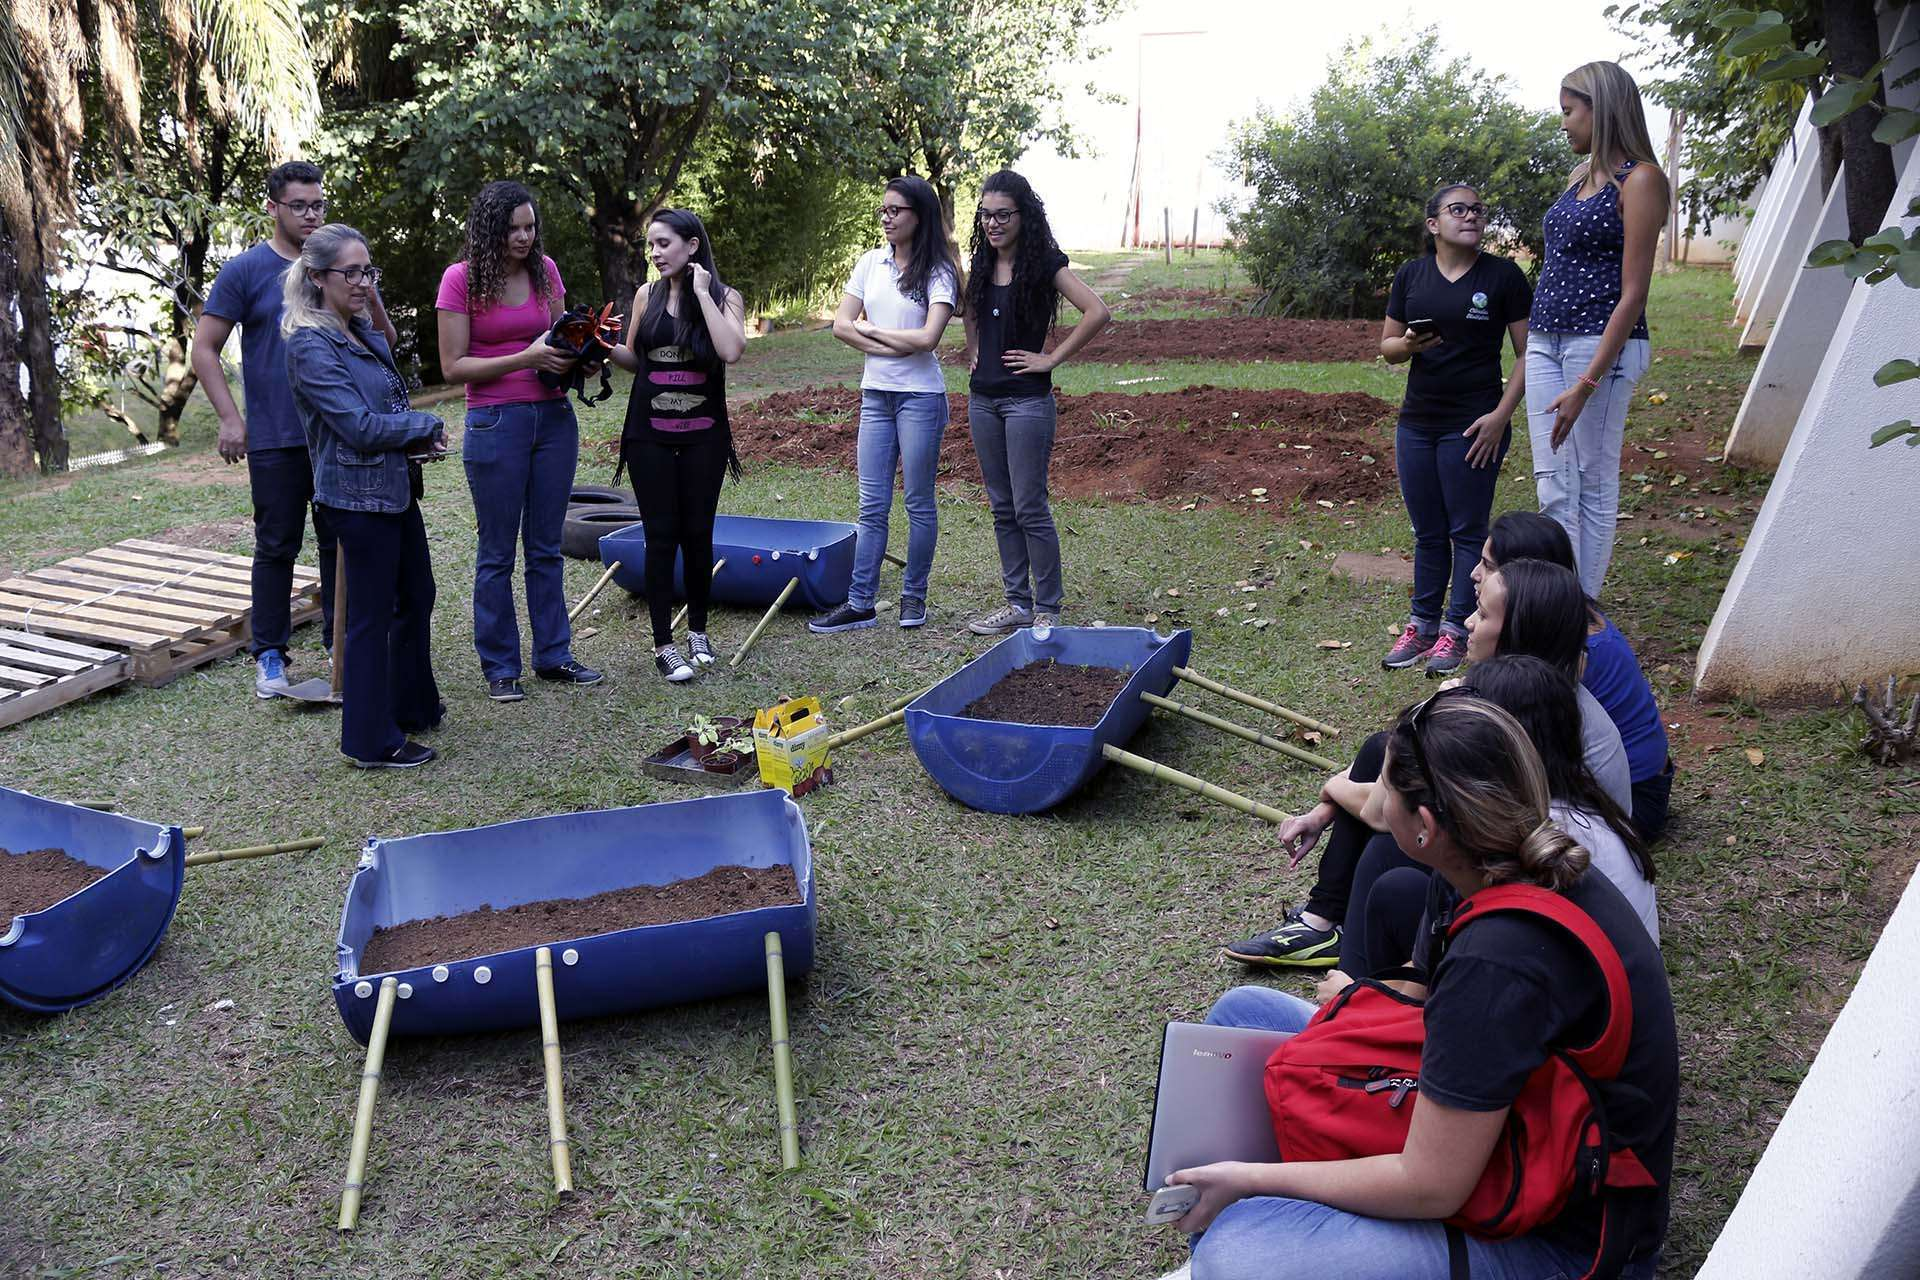 Professora e alunos organizando materiais do projeto. Foto: William Araújo